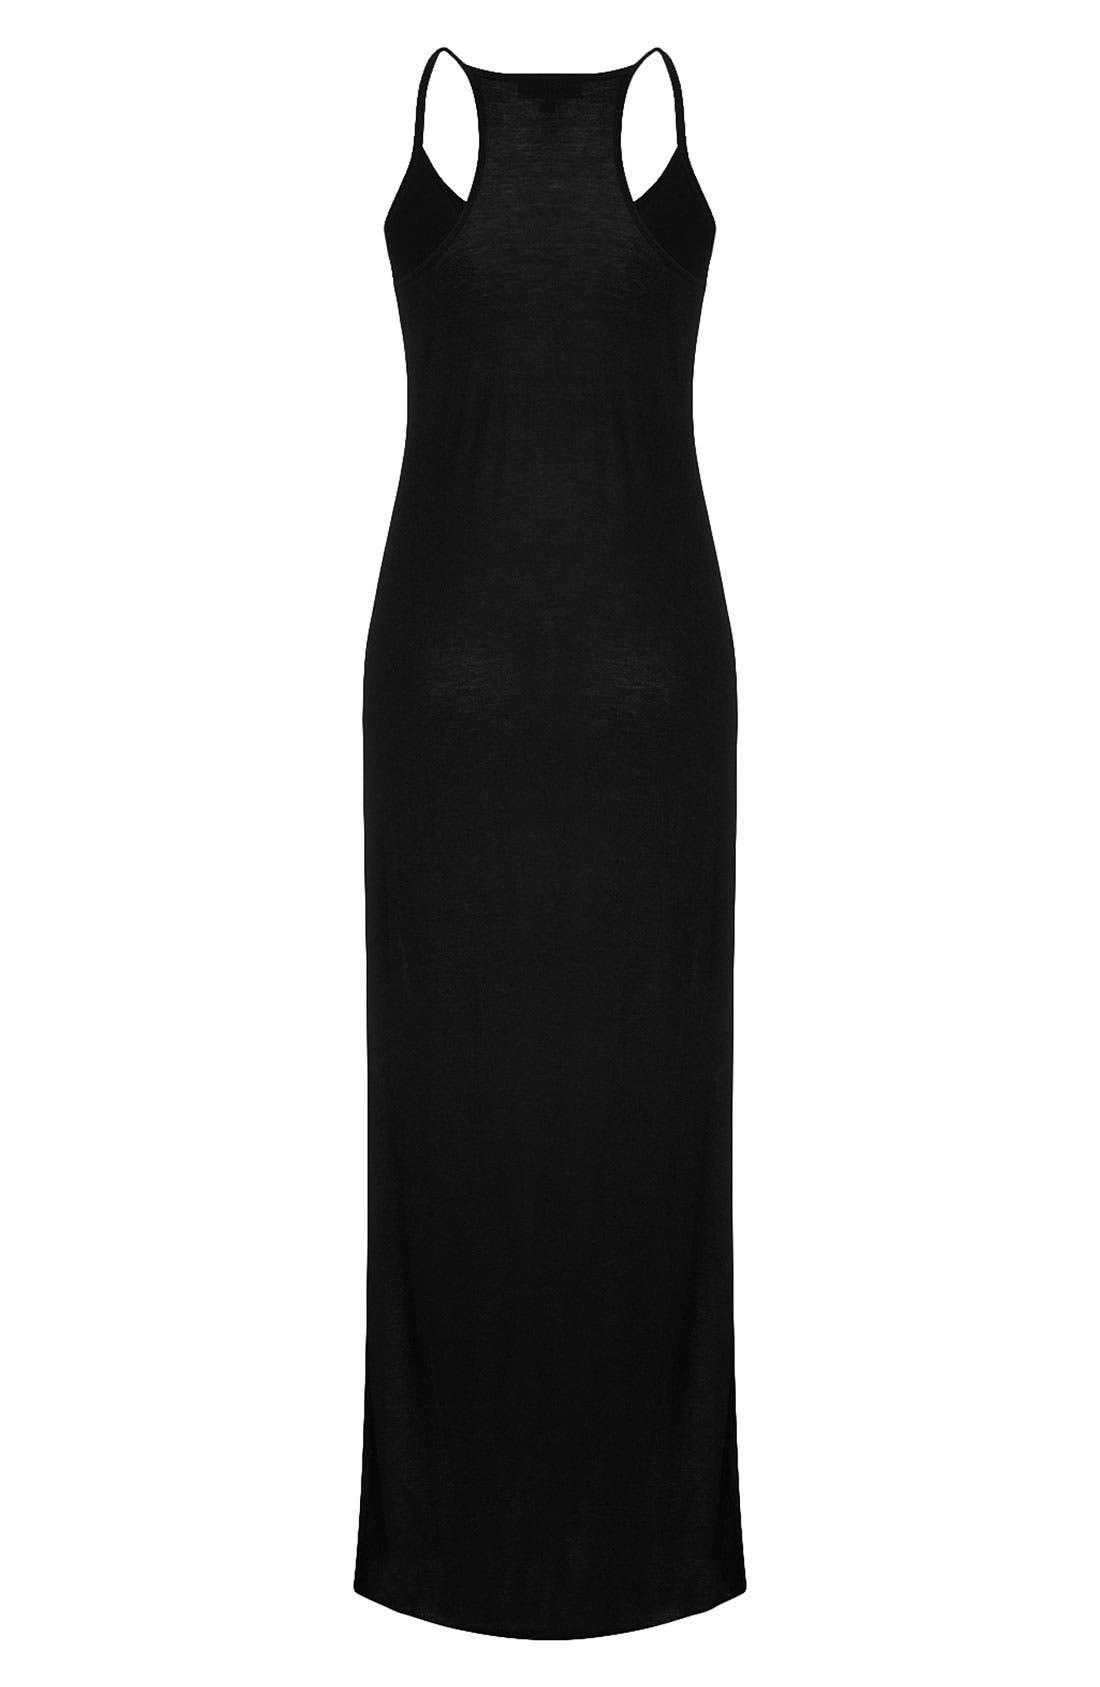 Cami Strap Maxi Dress,                         Main,                         color, Black